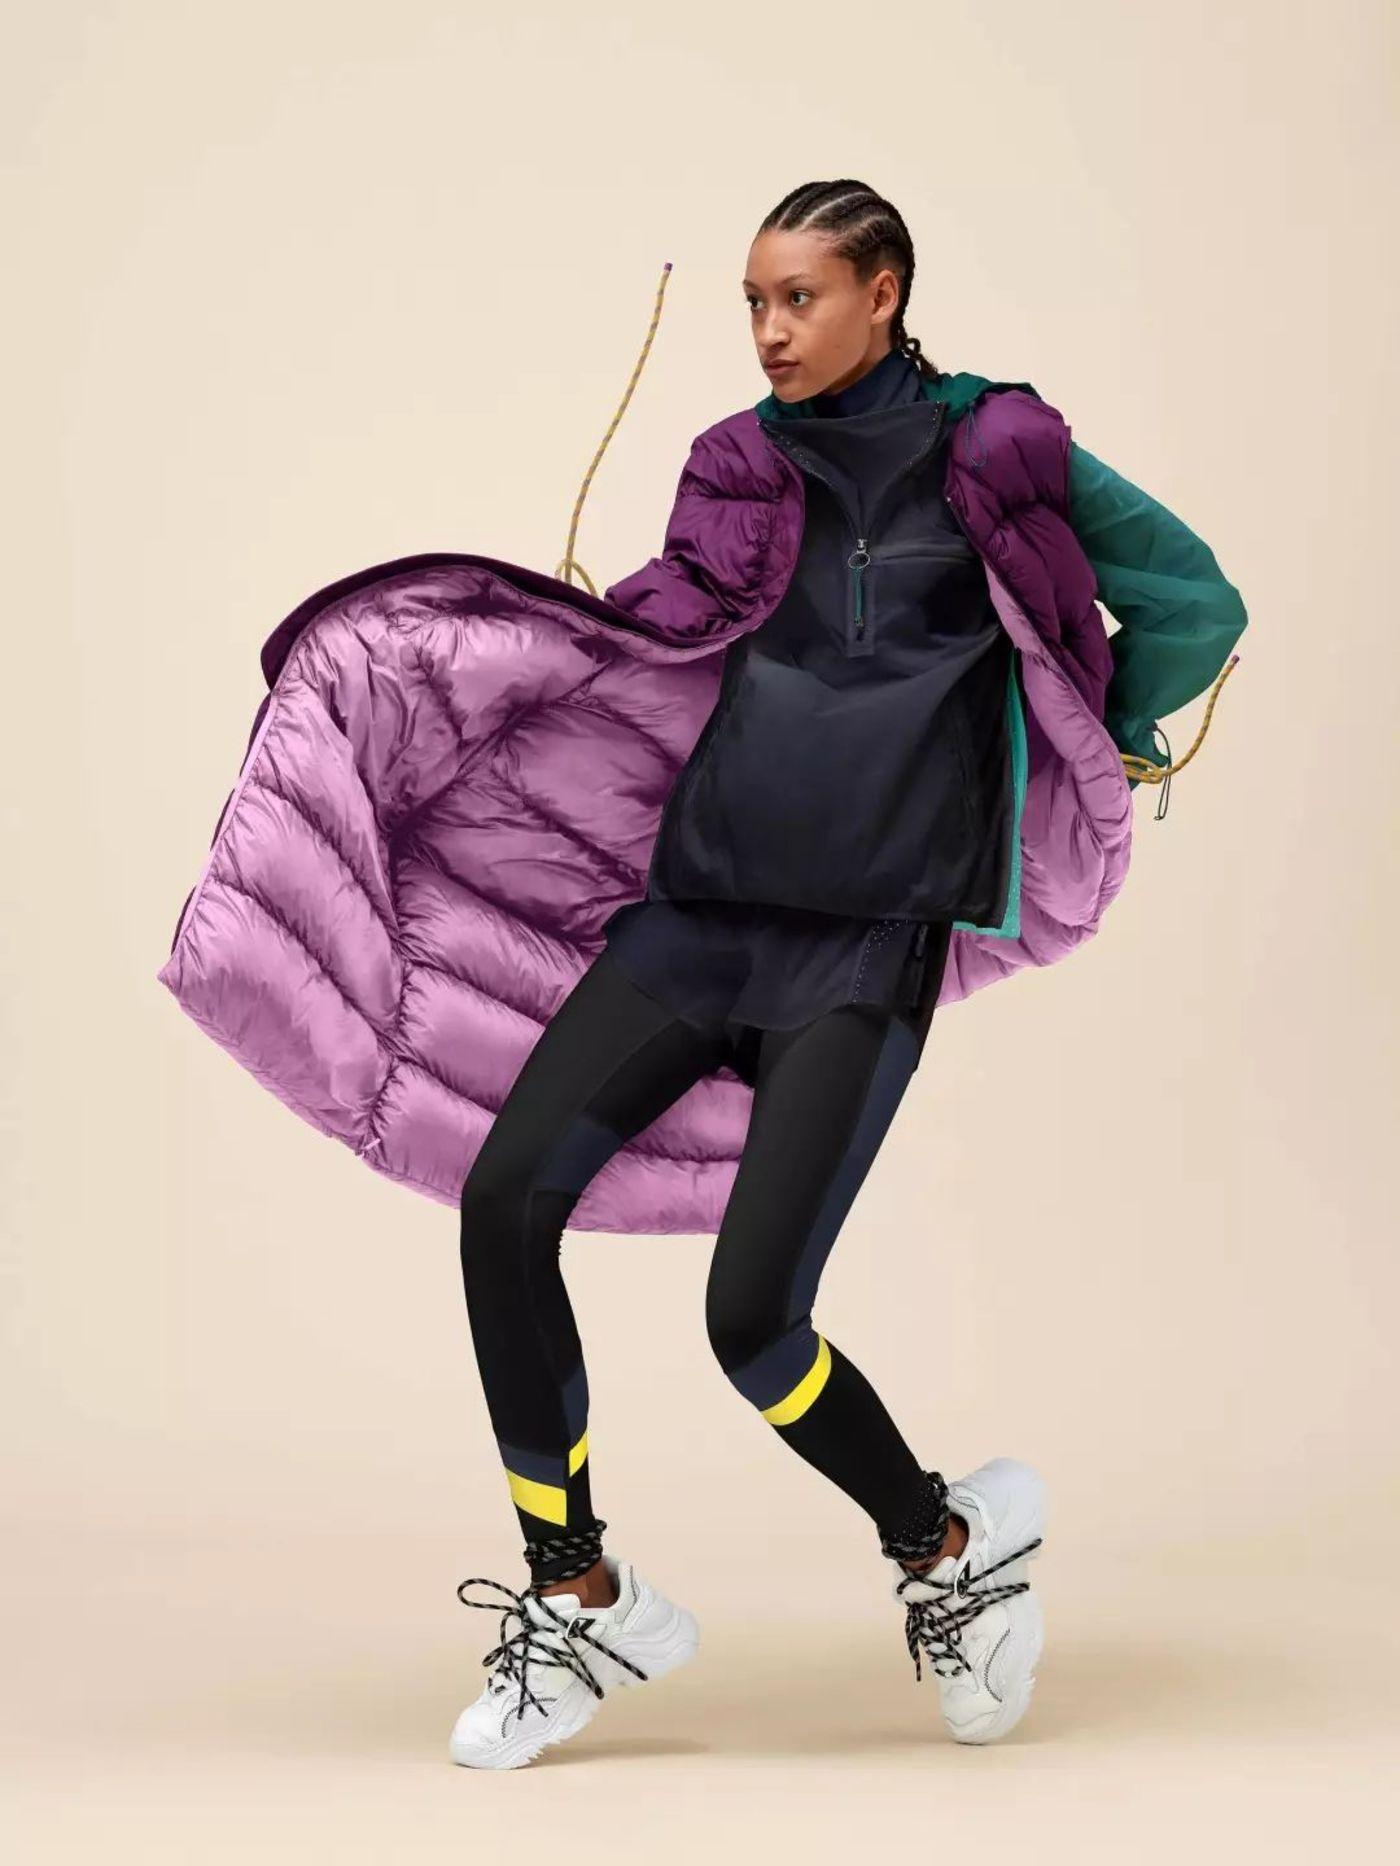 Lululemon x Roksanda 系列的外套,在网店已销售一空,售价 998 美元  图片来源:品牌官方